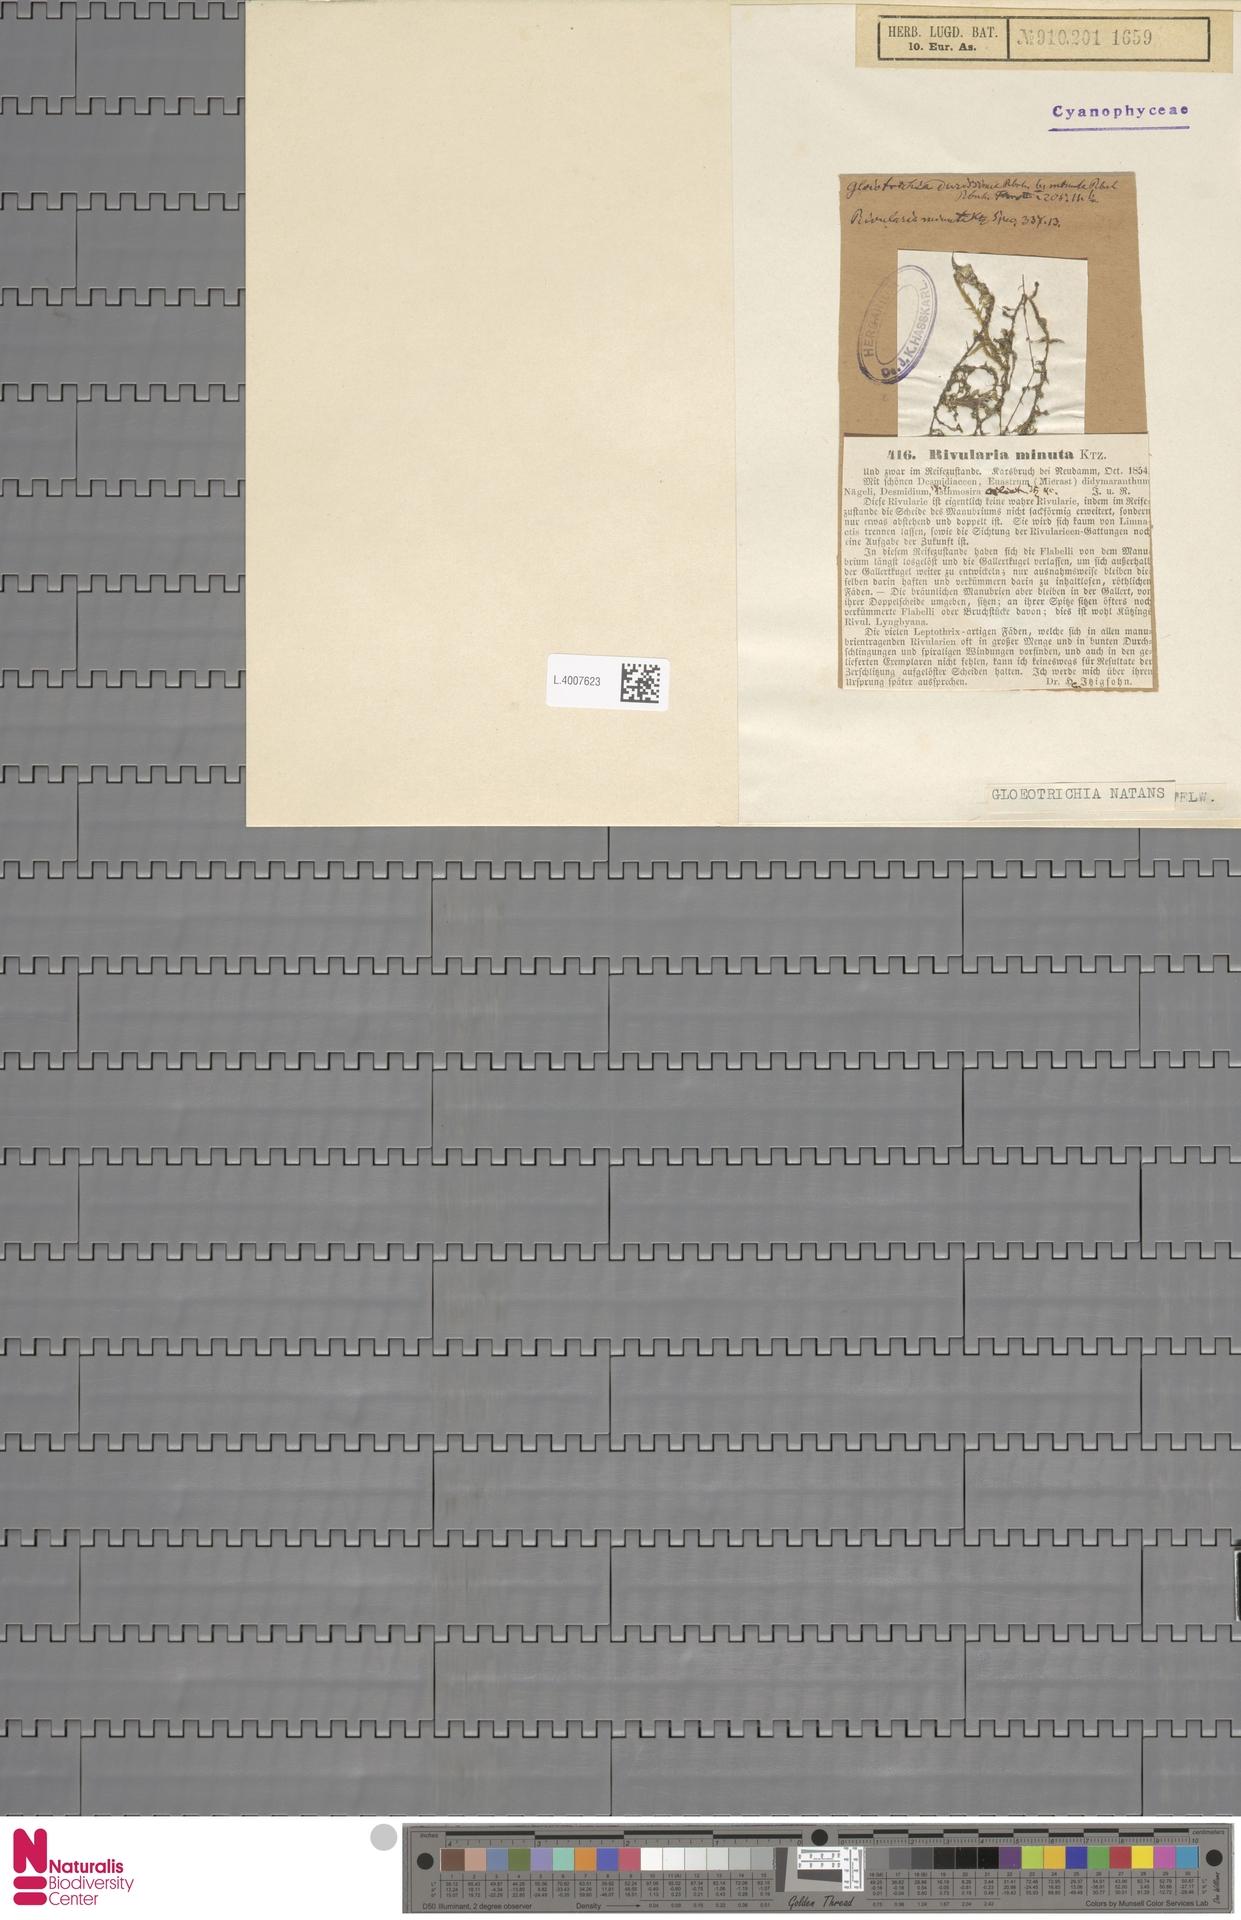 L.4007623 | Gloeotrichia natans (Hedw.) Rabenh. ex Bornet & Flahault